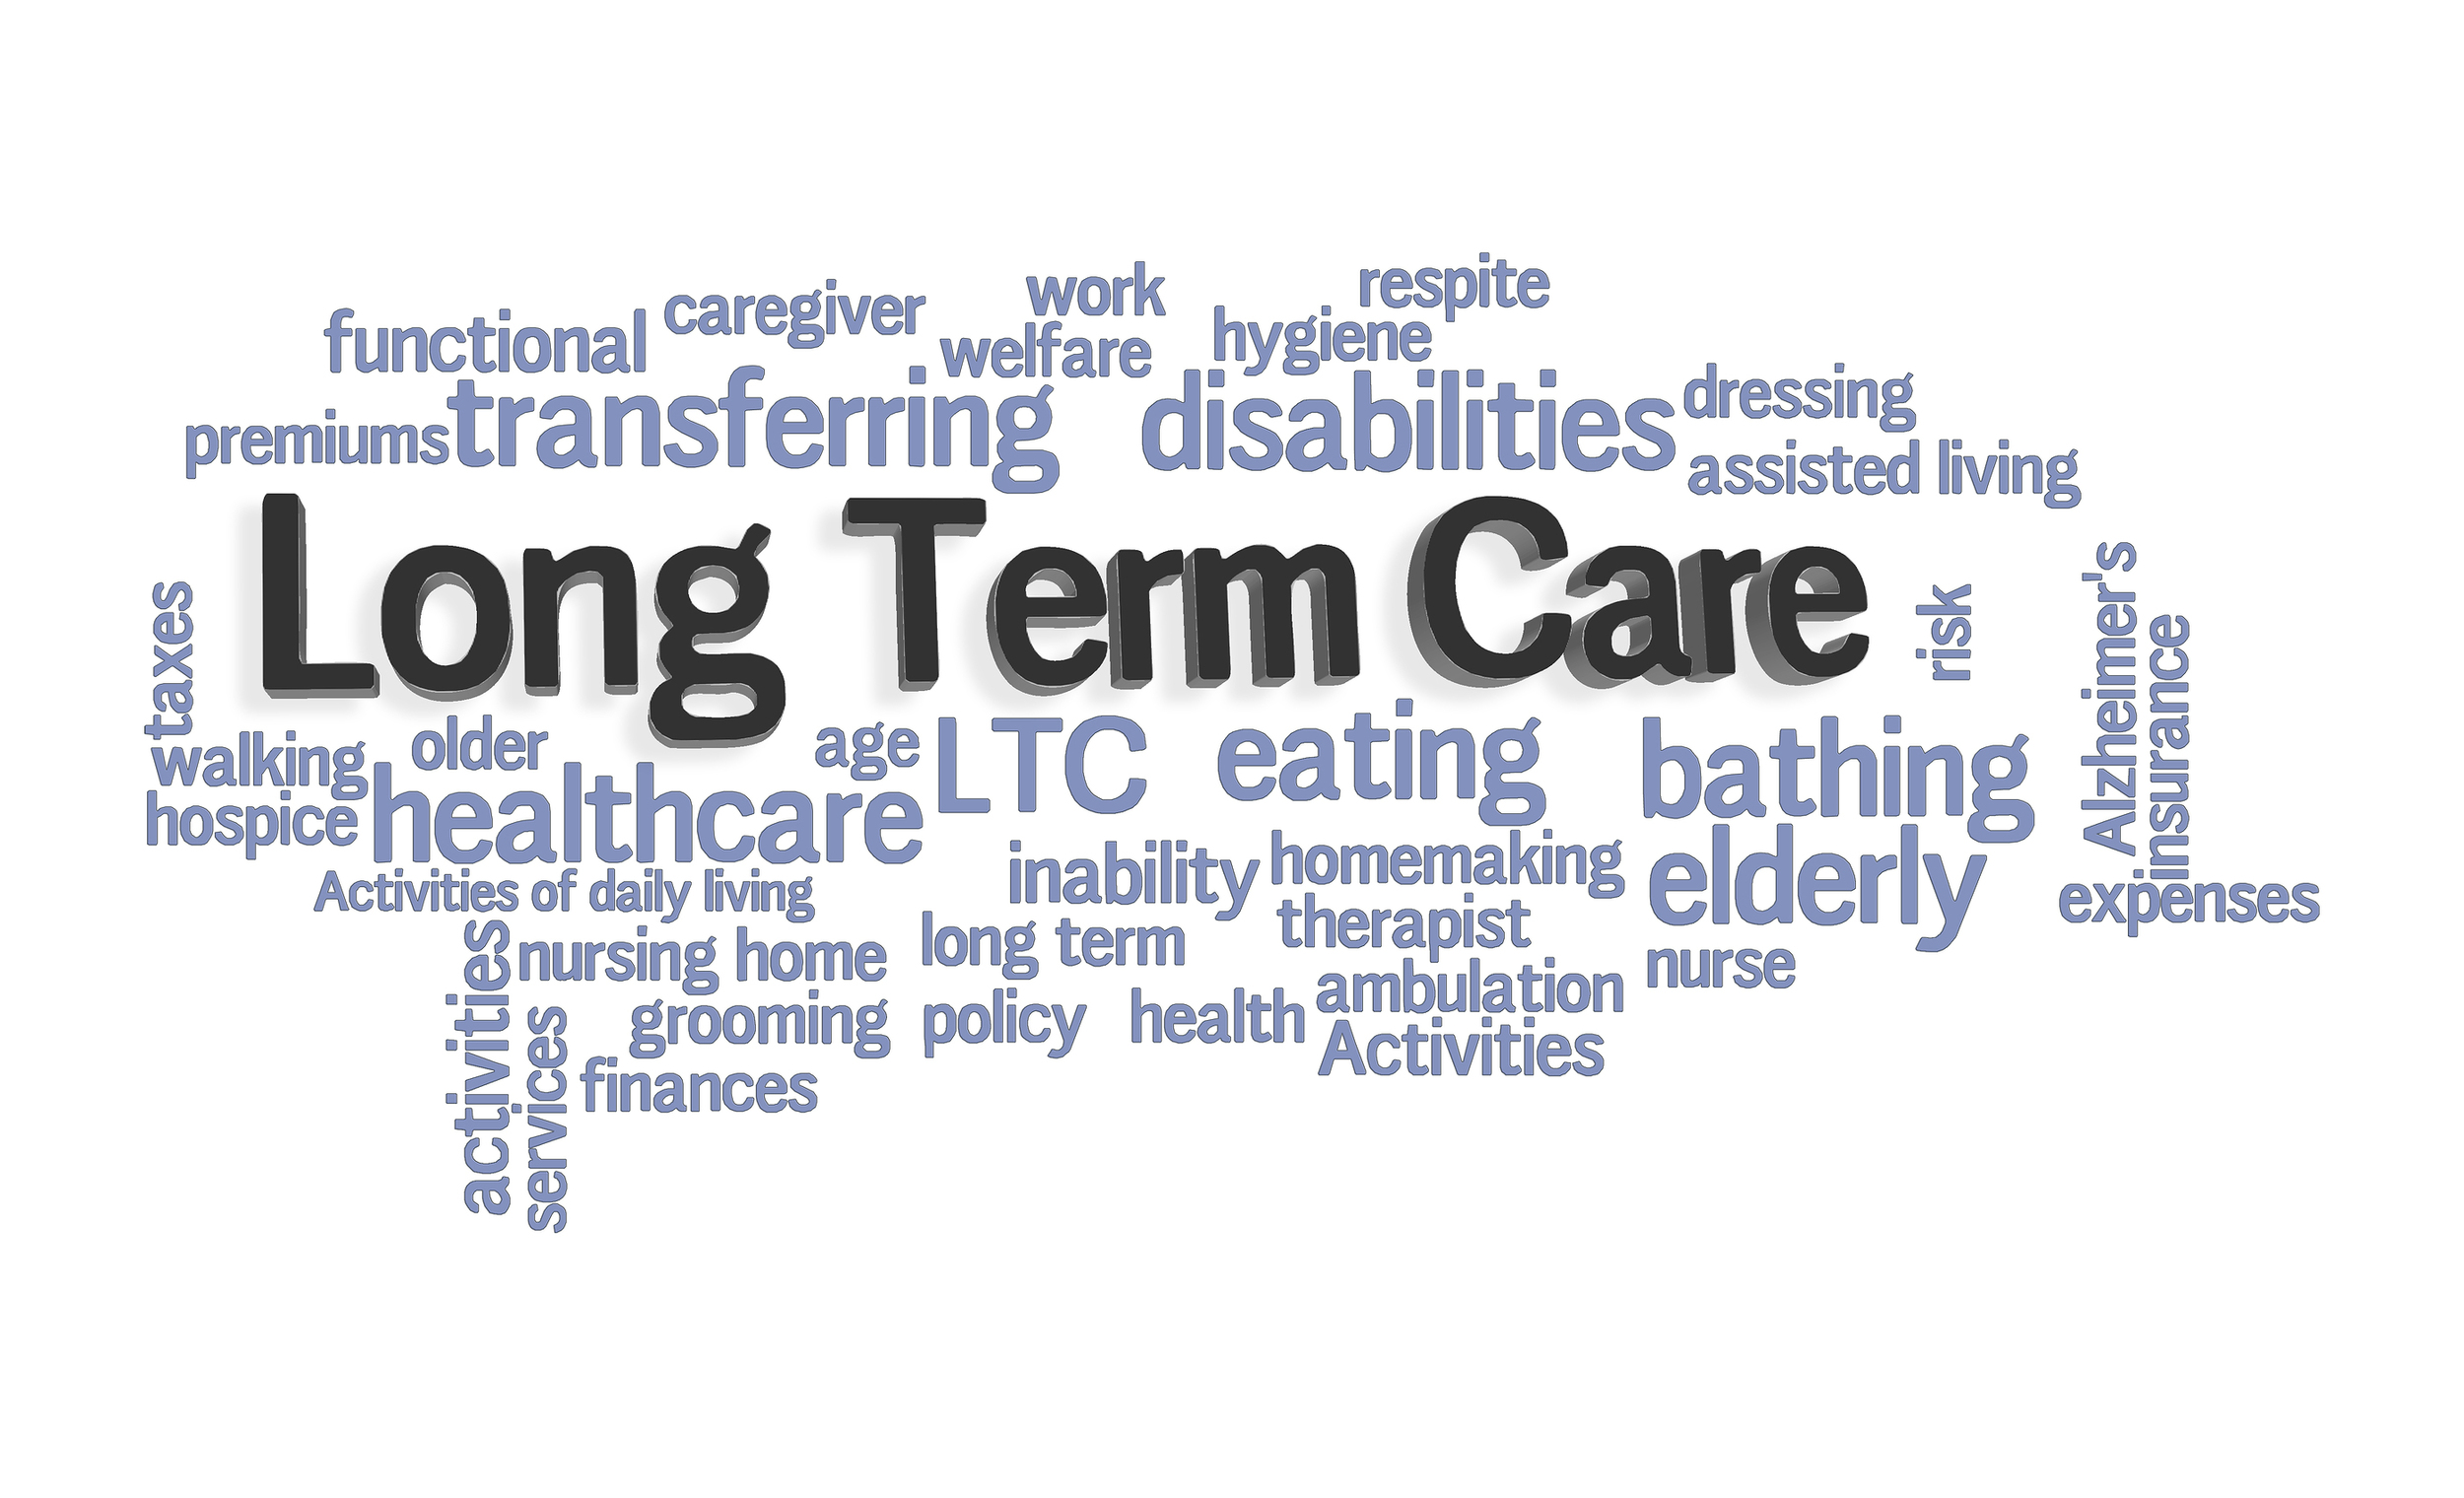 bigstock-Long-Term-Care-Word-Cloud-18147854.jpg